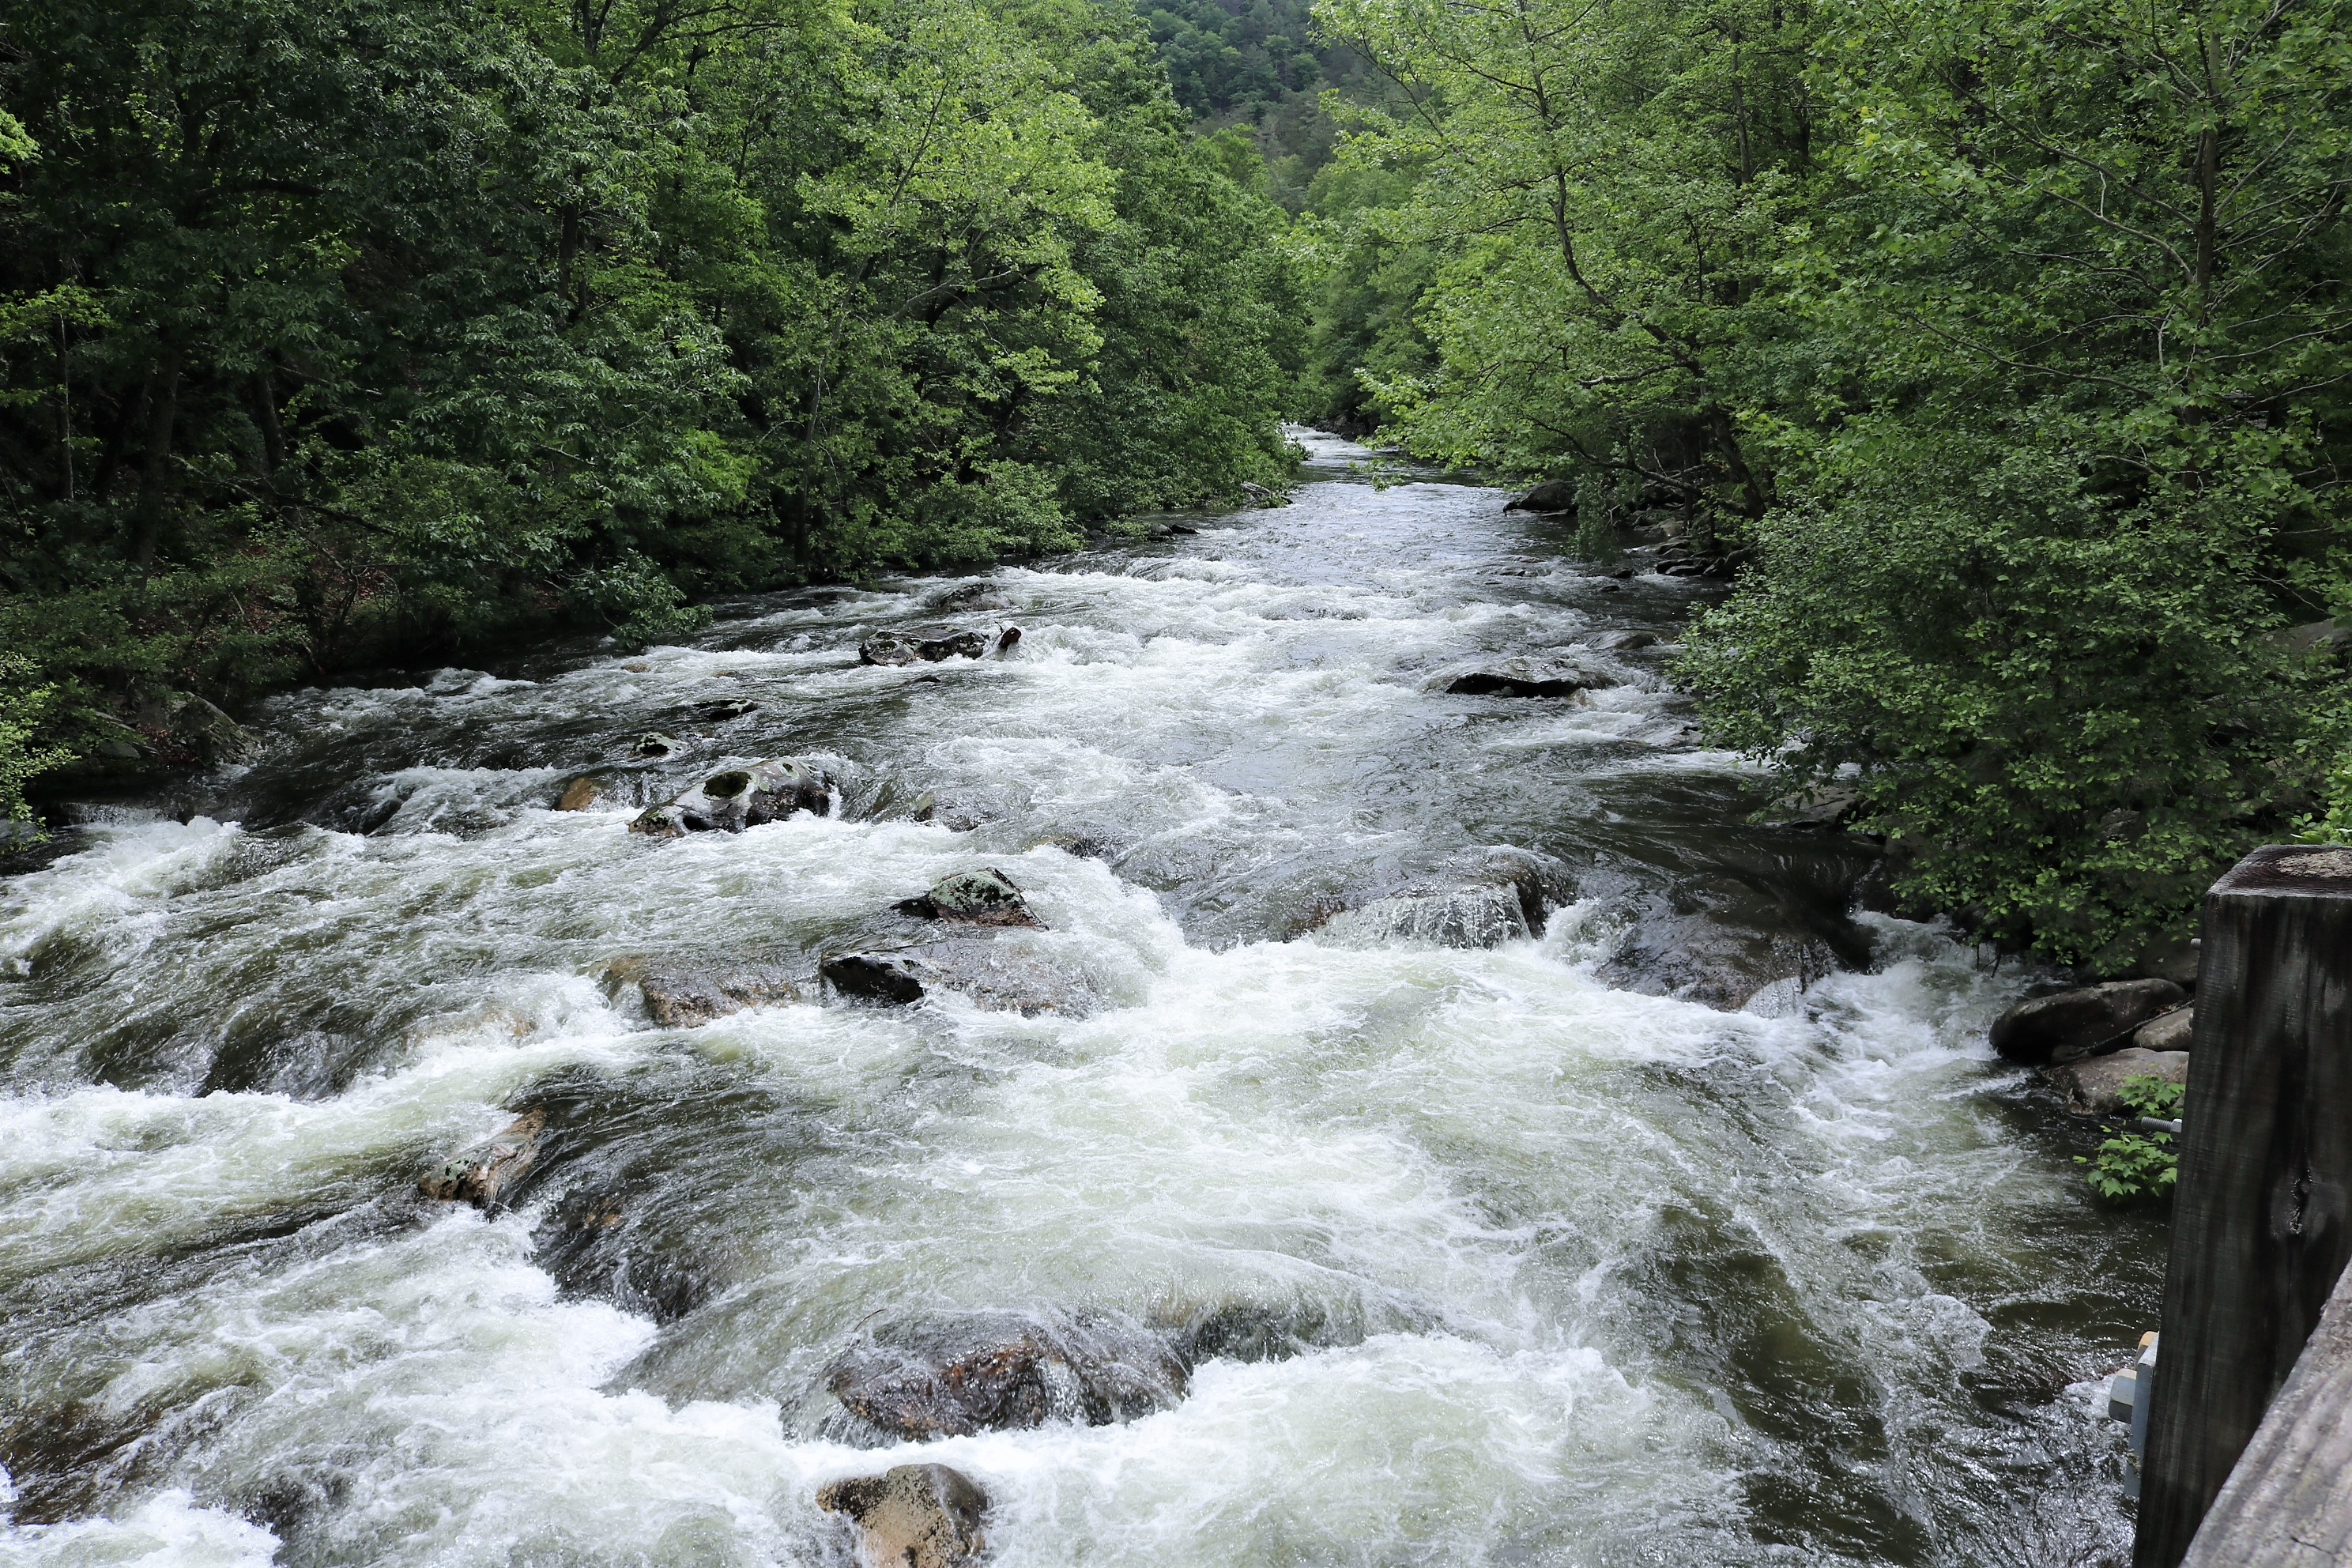 19 Tellico River Tn June Easing Along